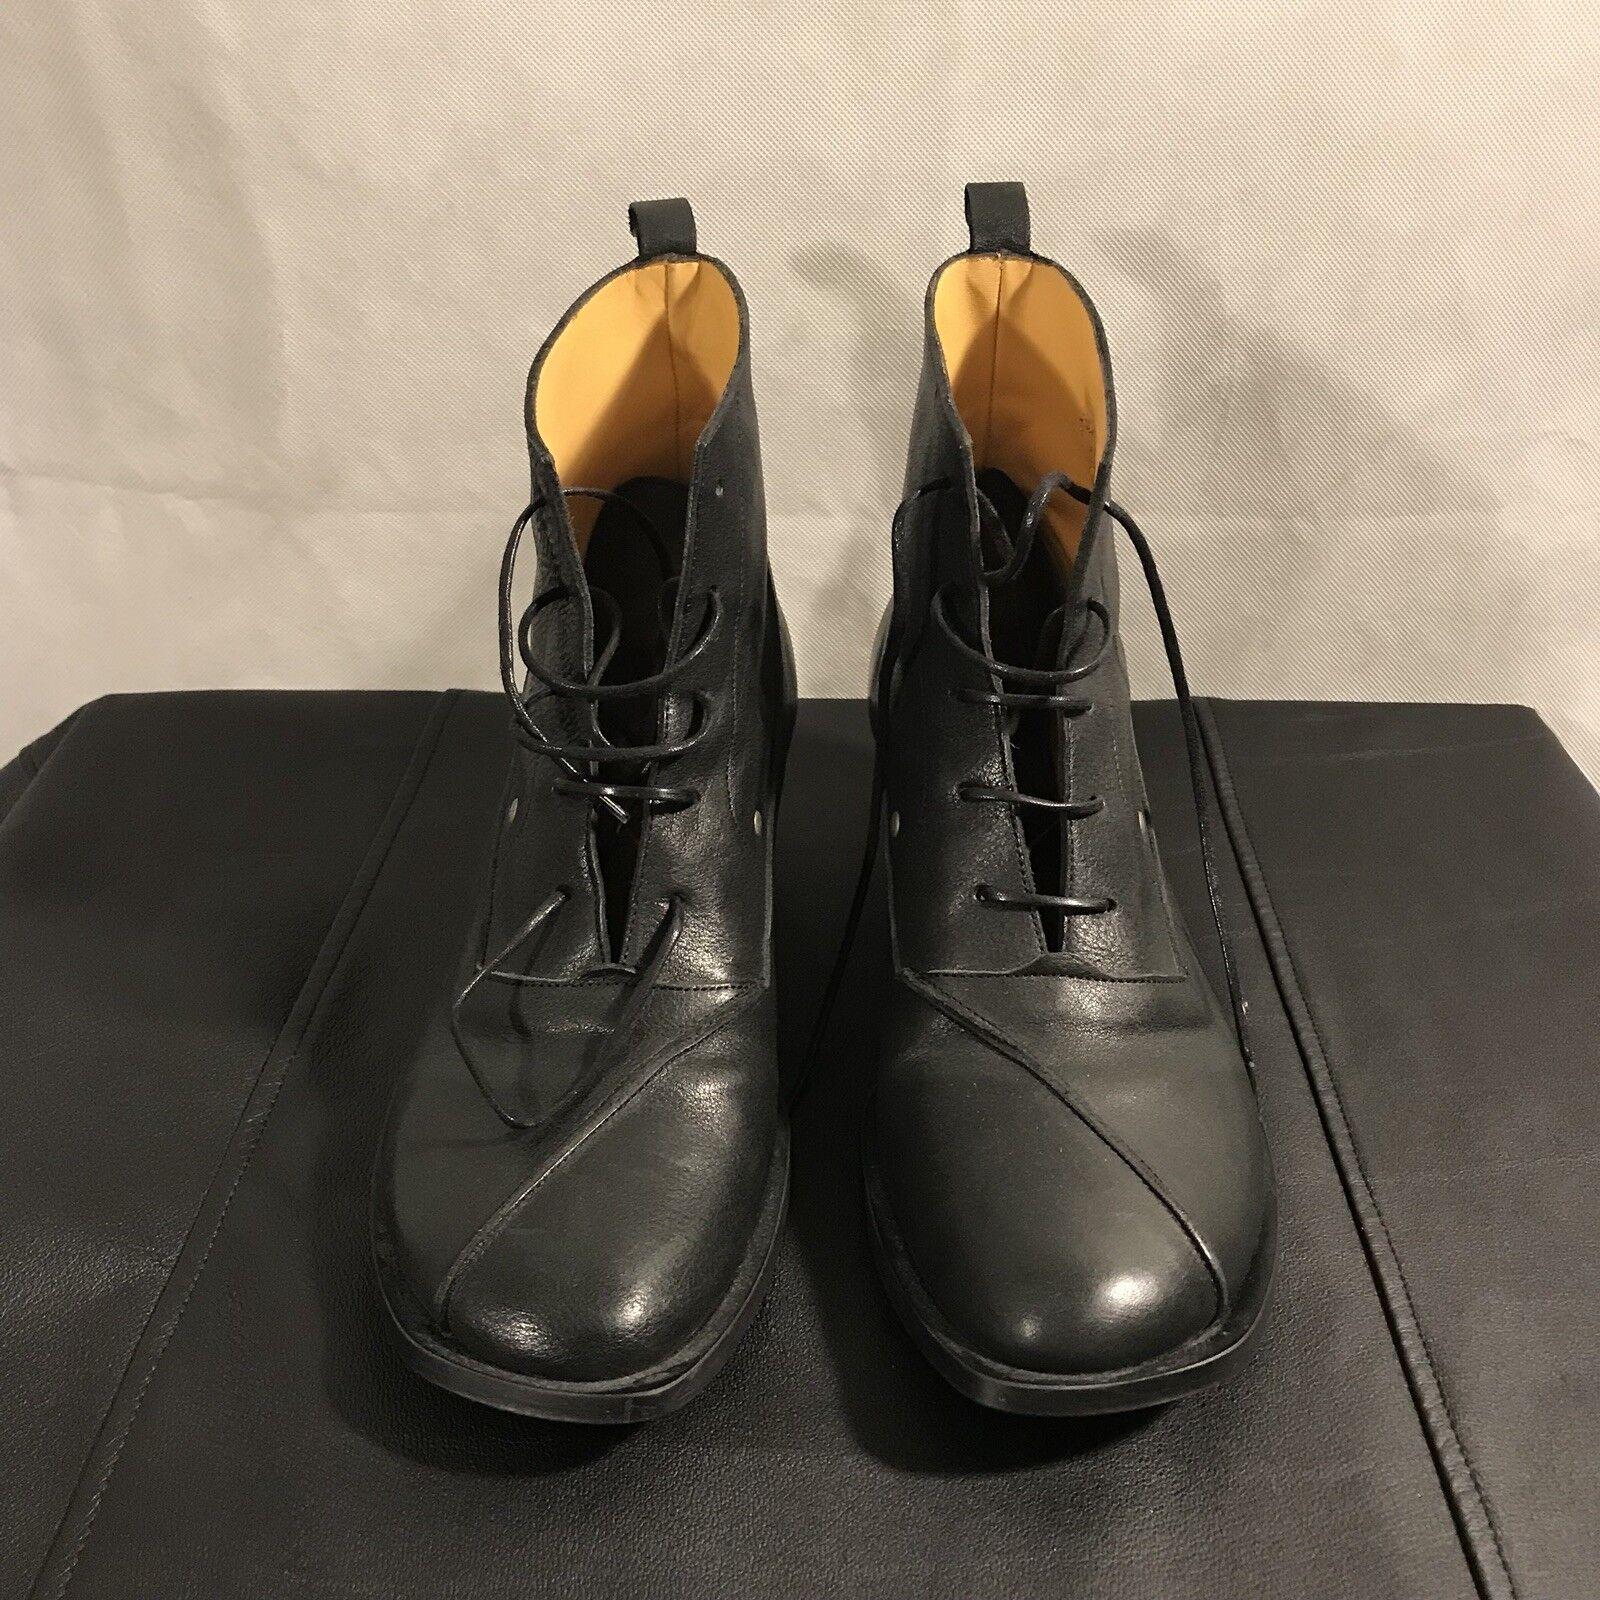 JOHN FLUEVOG Classic Oxford Cubic Heel Boot, Sz. 11